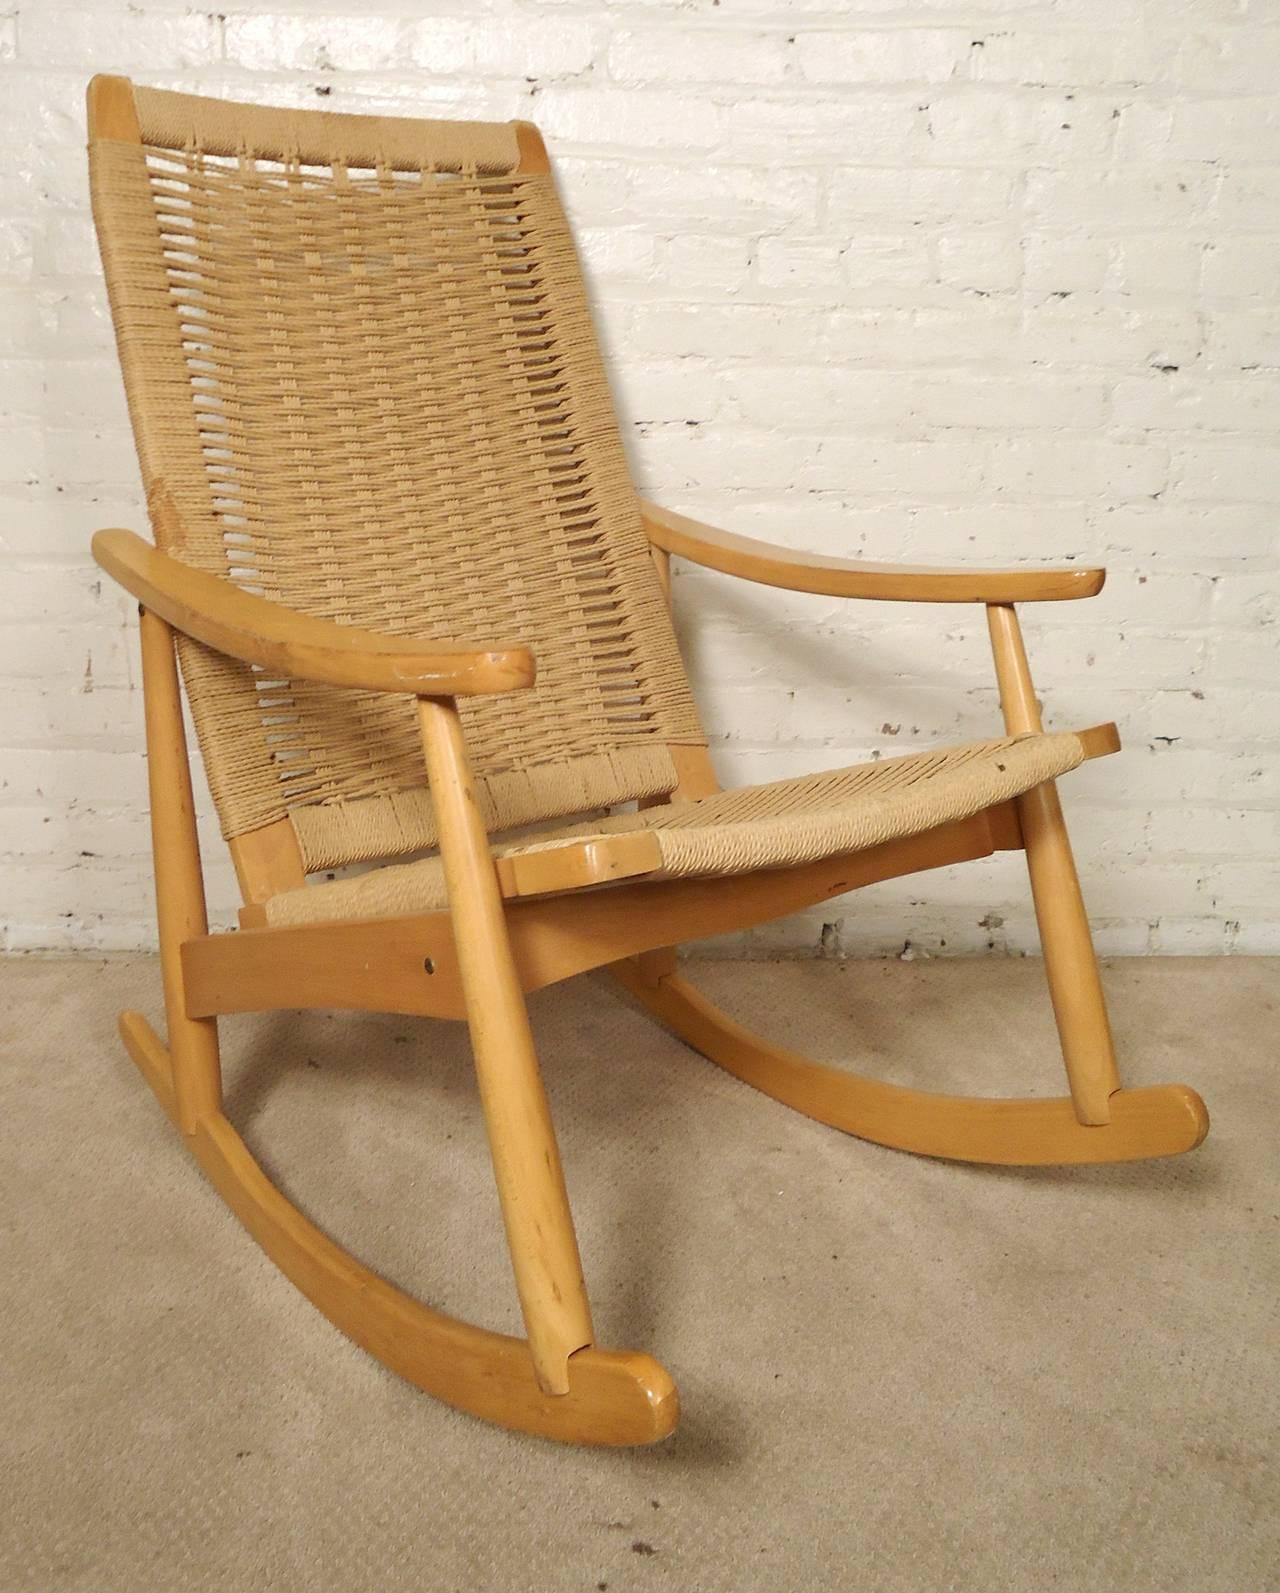 hans wegner style rope rocking chair at 1stdibs. Black Bedroom Furniture Sets. Home Design Ideas